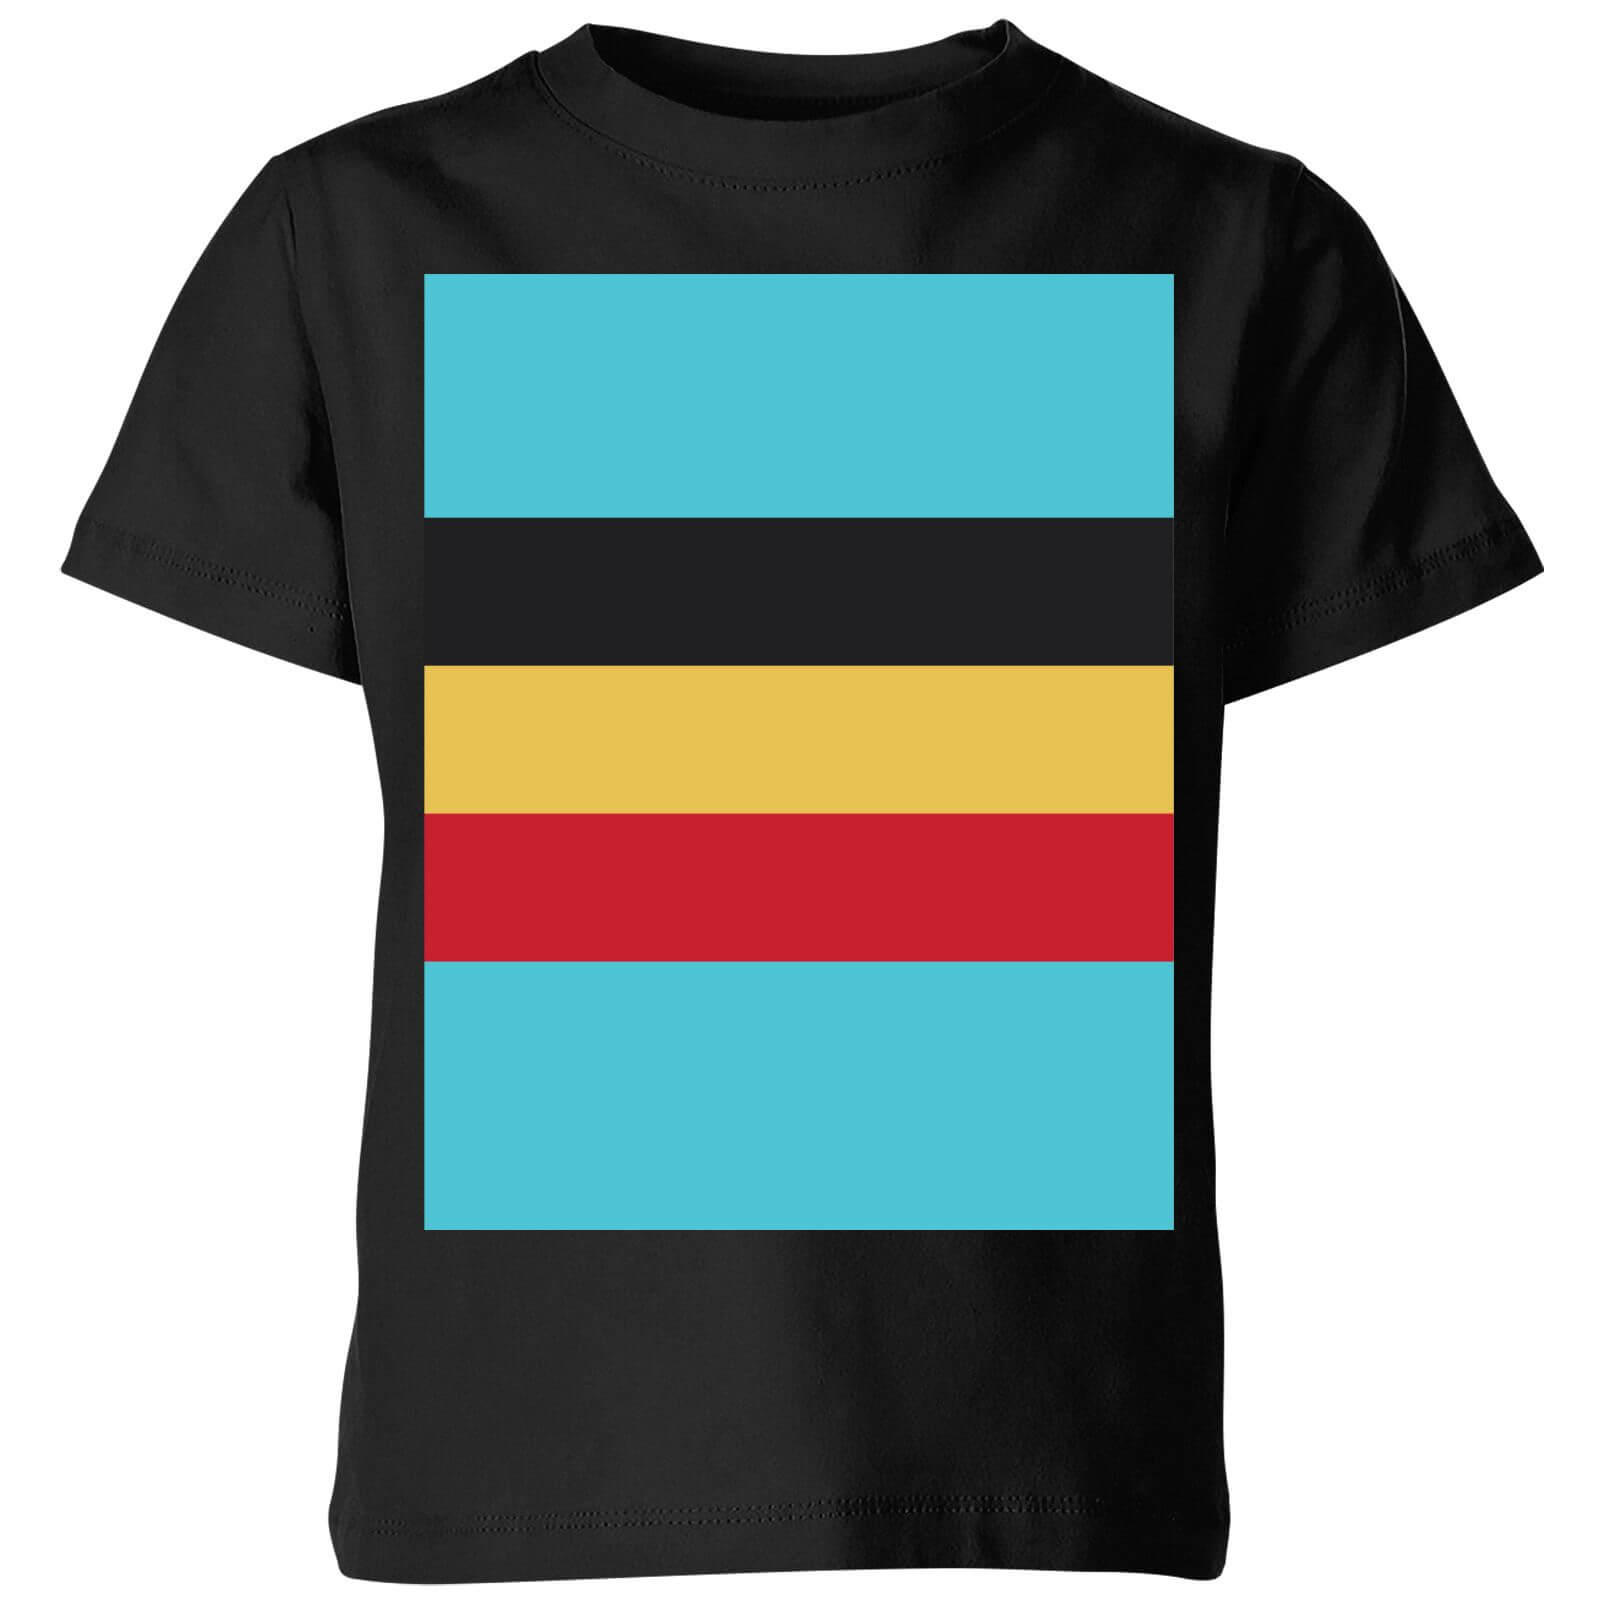 Summit Finish Belgium Flag Kids T-shirt - Black - 3-4 Years - Black